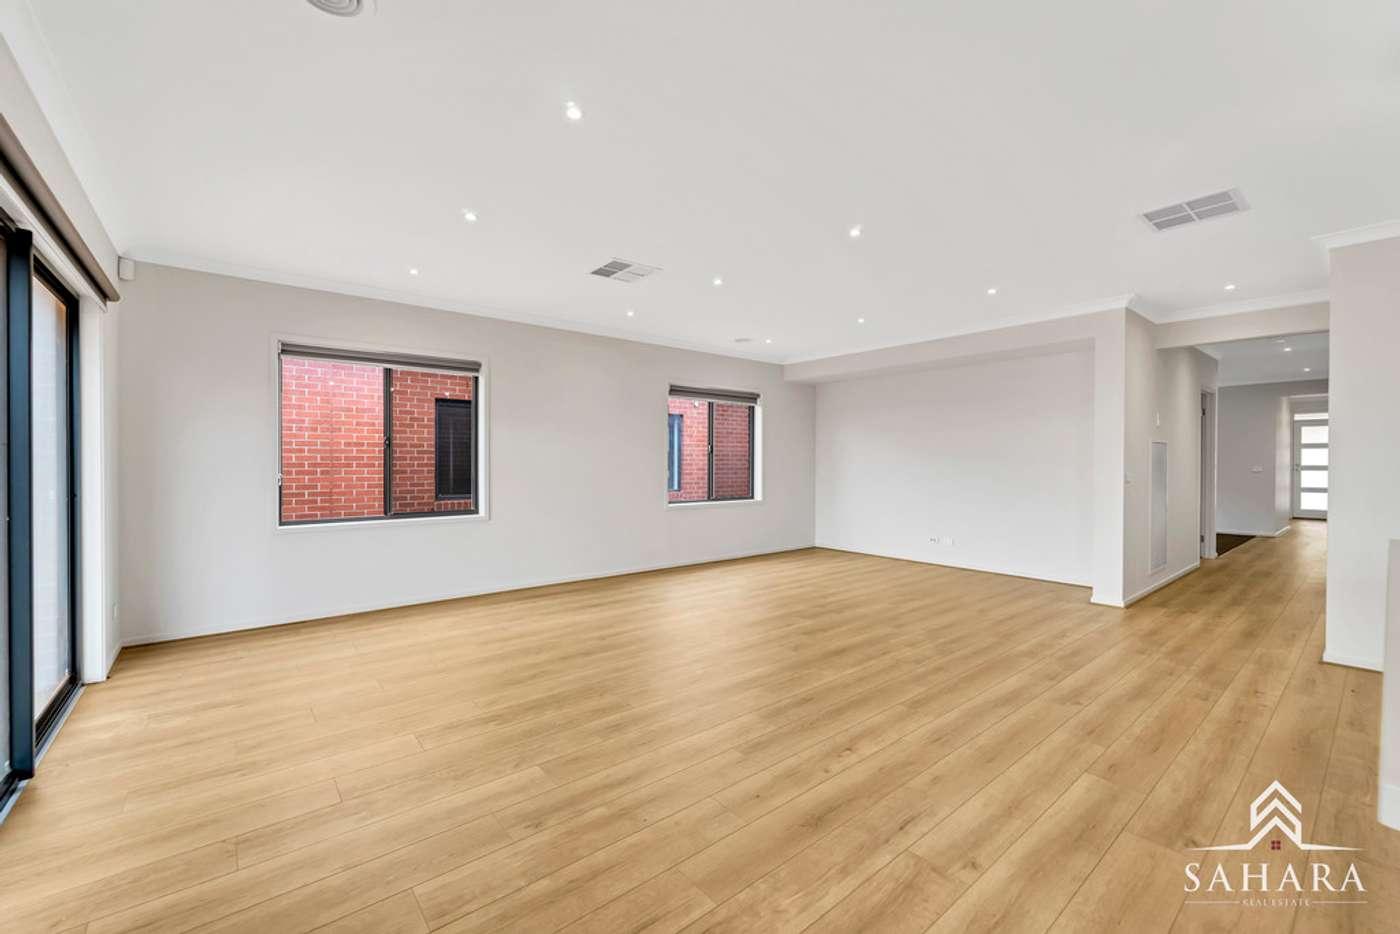 Seventh view of Homely house listing, 12 Brasillia Street, Strathtulloh VIC 3338